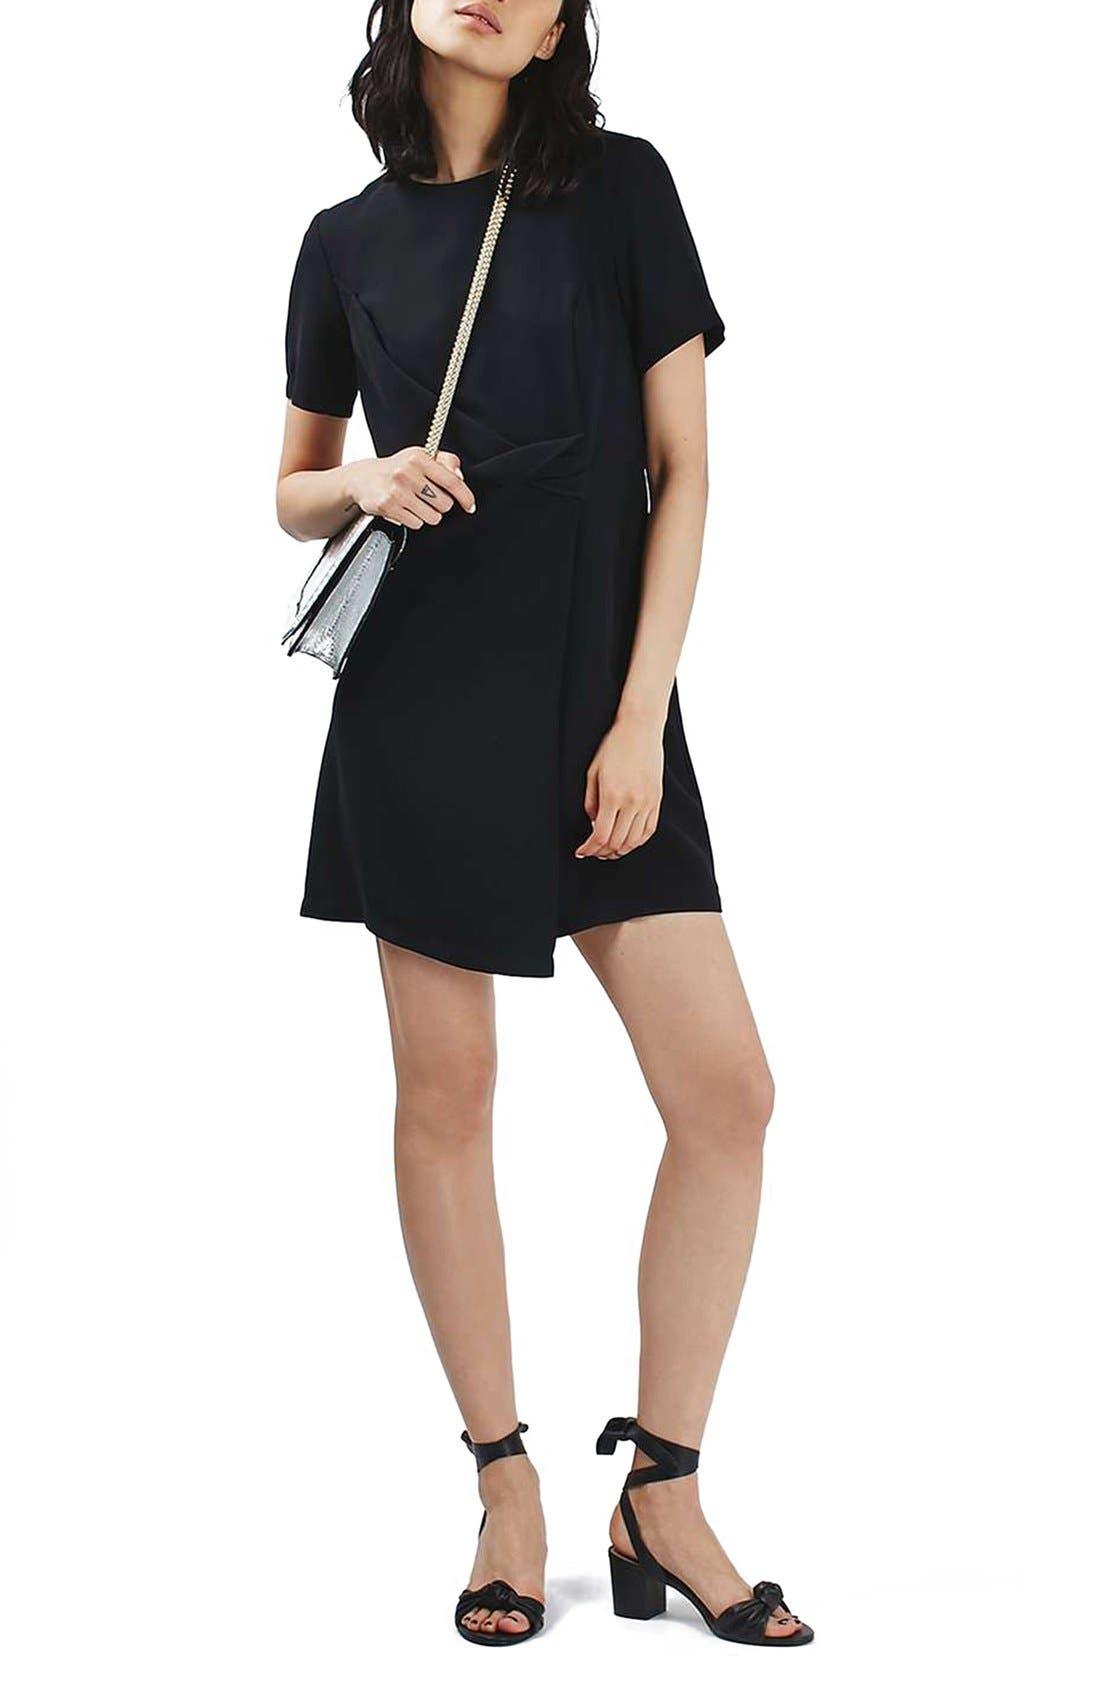 Alternate Image 1 Selected - Topshop Drape Front Dress